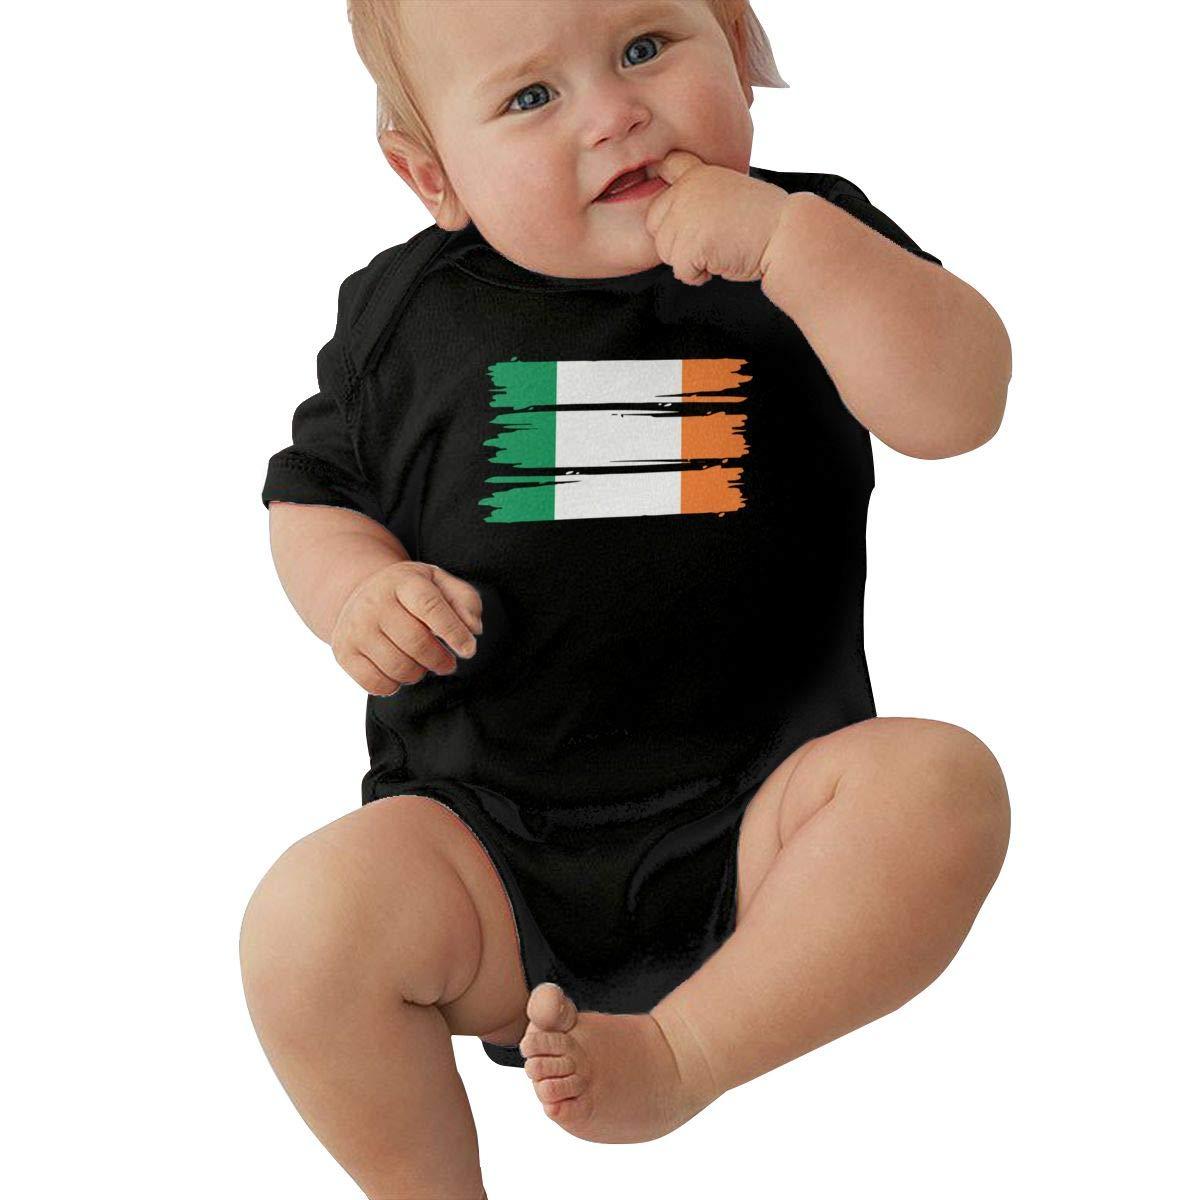 Suit 6-24 Months TAOHJS97 Baby Boys Irish Flag Short Sleeve Climbing Clothes Pajamas Sleepwear